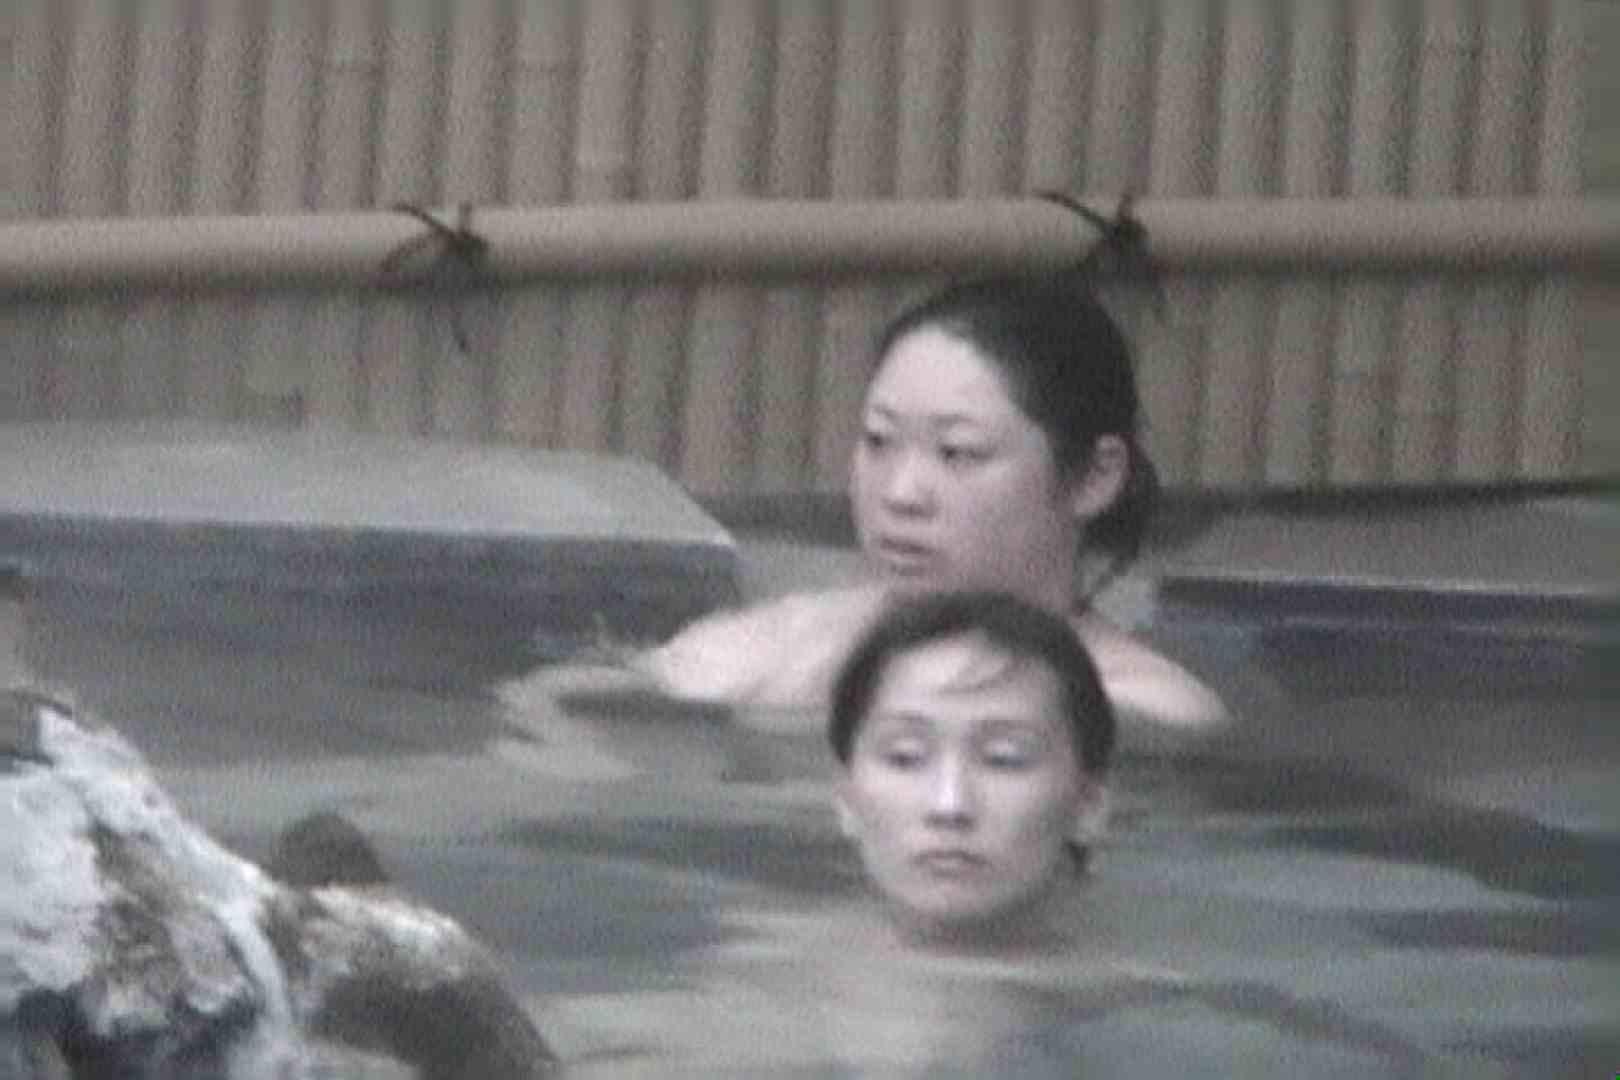 Aquaな露天風呂Vol.557 露天風呂編  100PIX 34